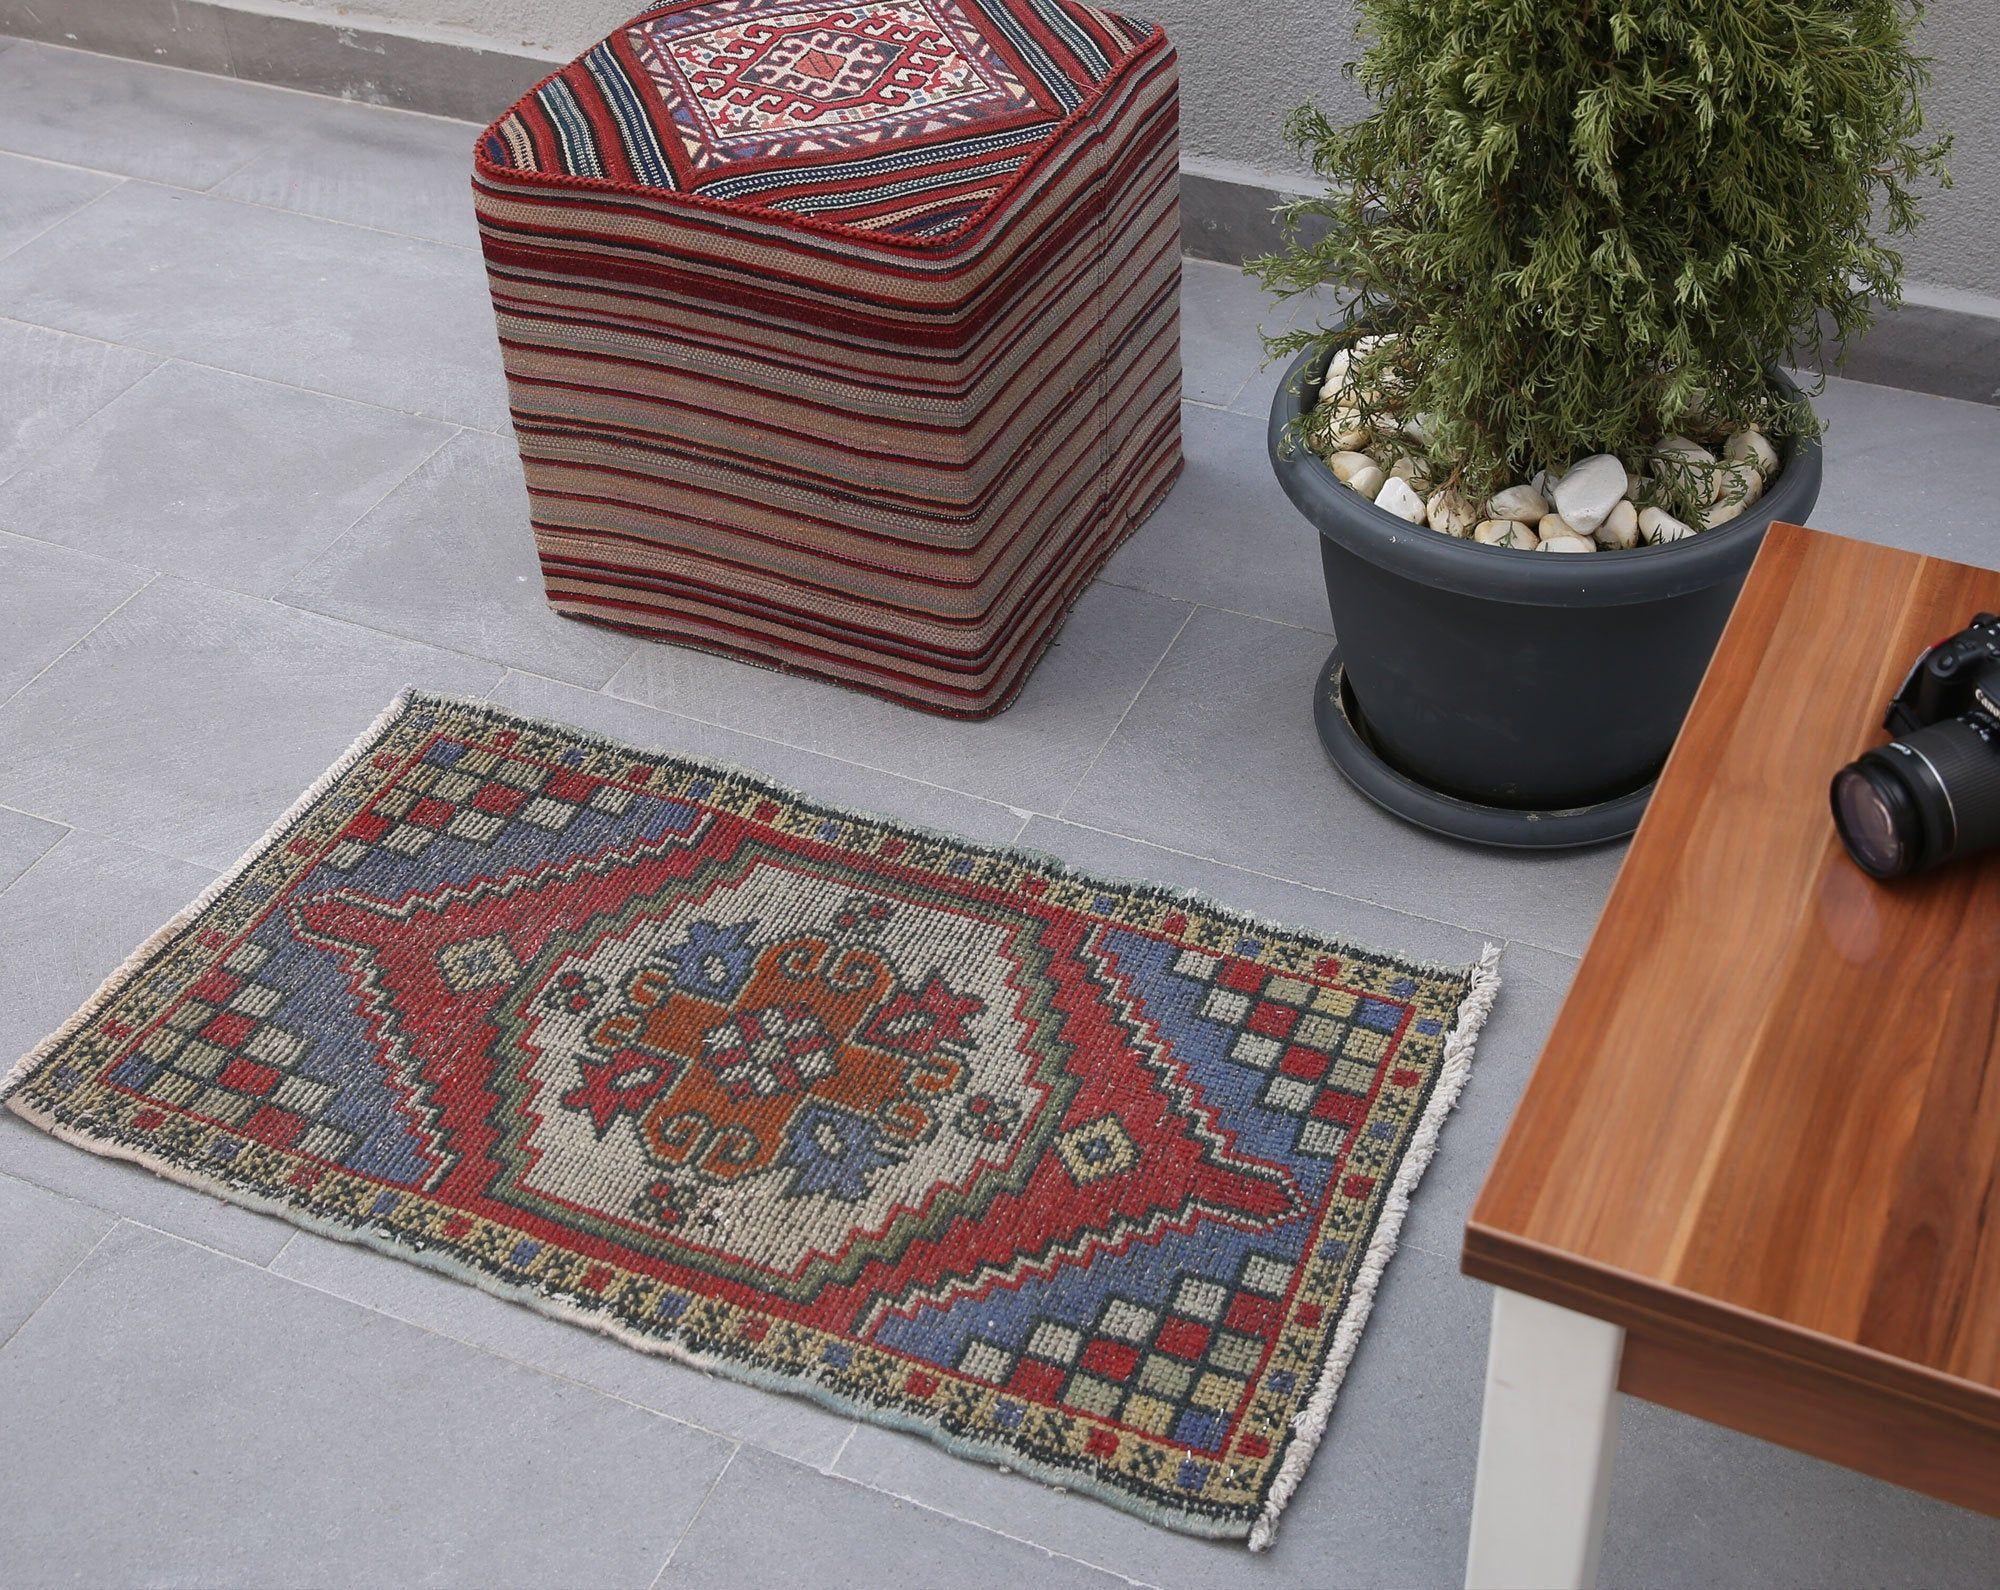 Turkish Rug Farmhouse Teppich Persian Area Rug Kitchen Oriental 1 8 X 3 1 Code 081773 In 2020 Persian Area Rugs Rugs Turkish Rug